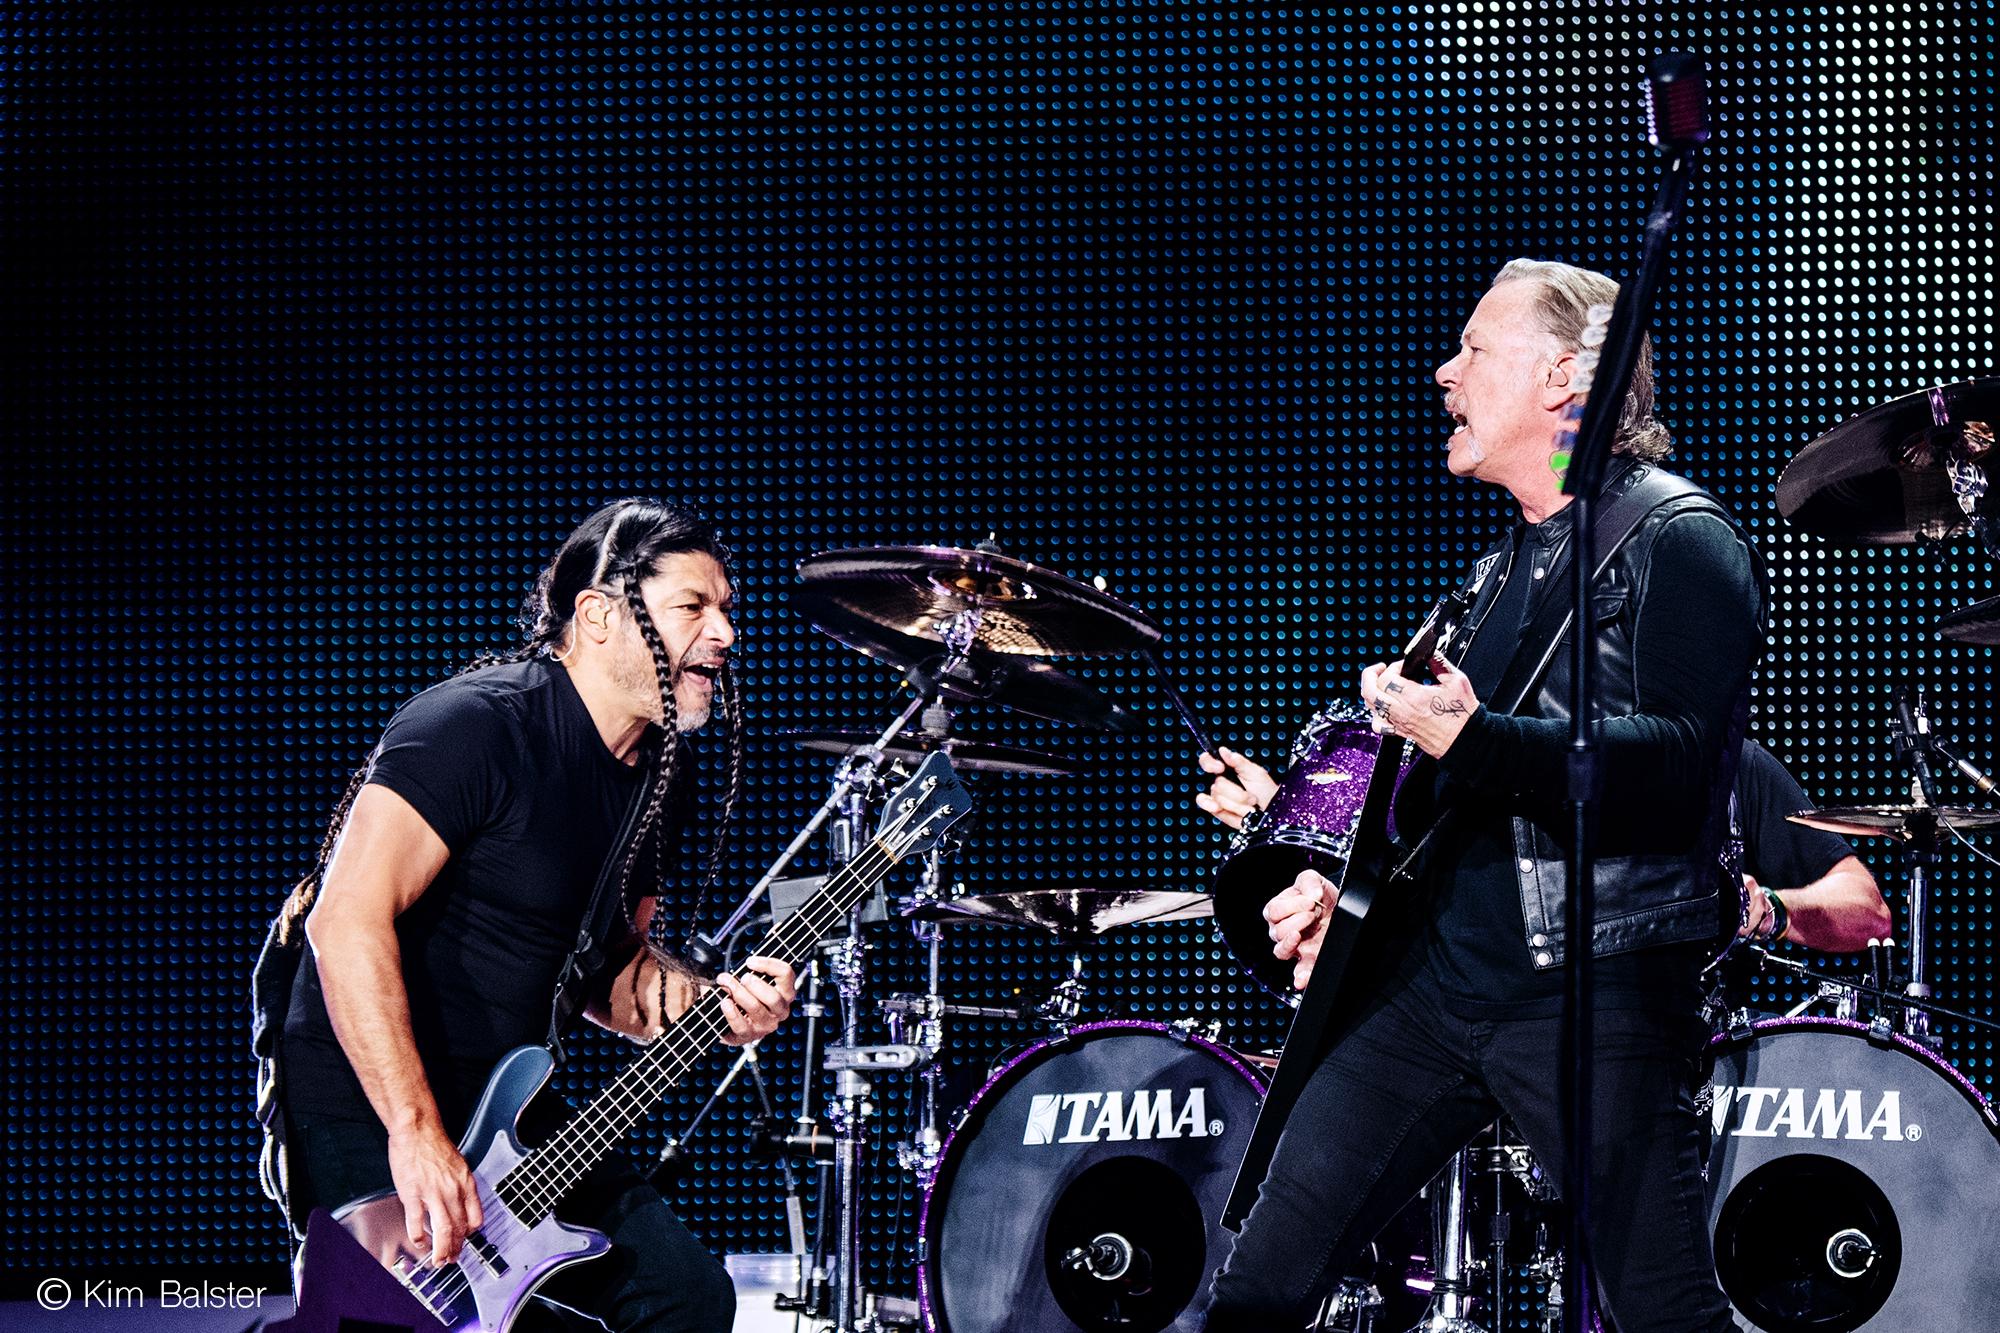 Soundz Metallica